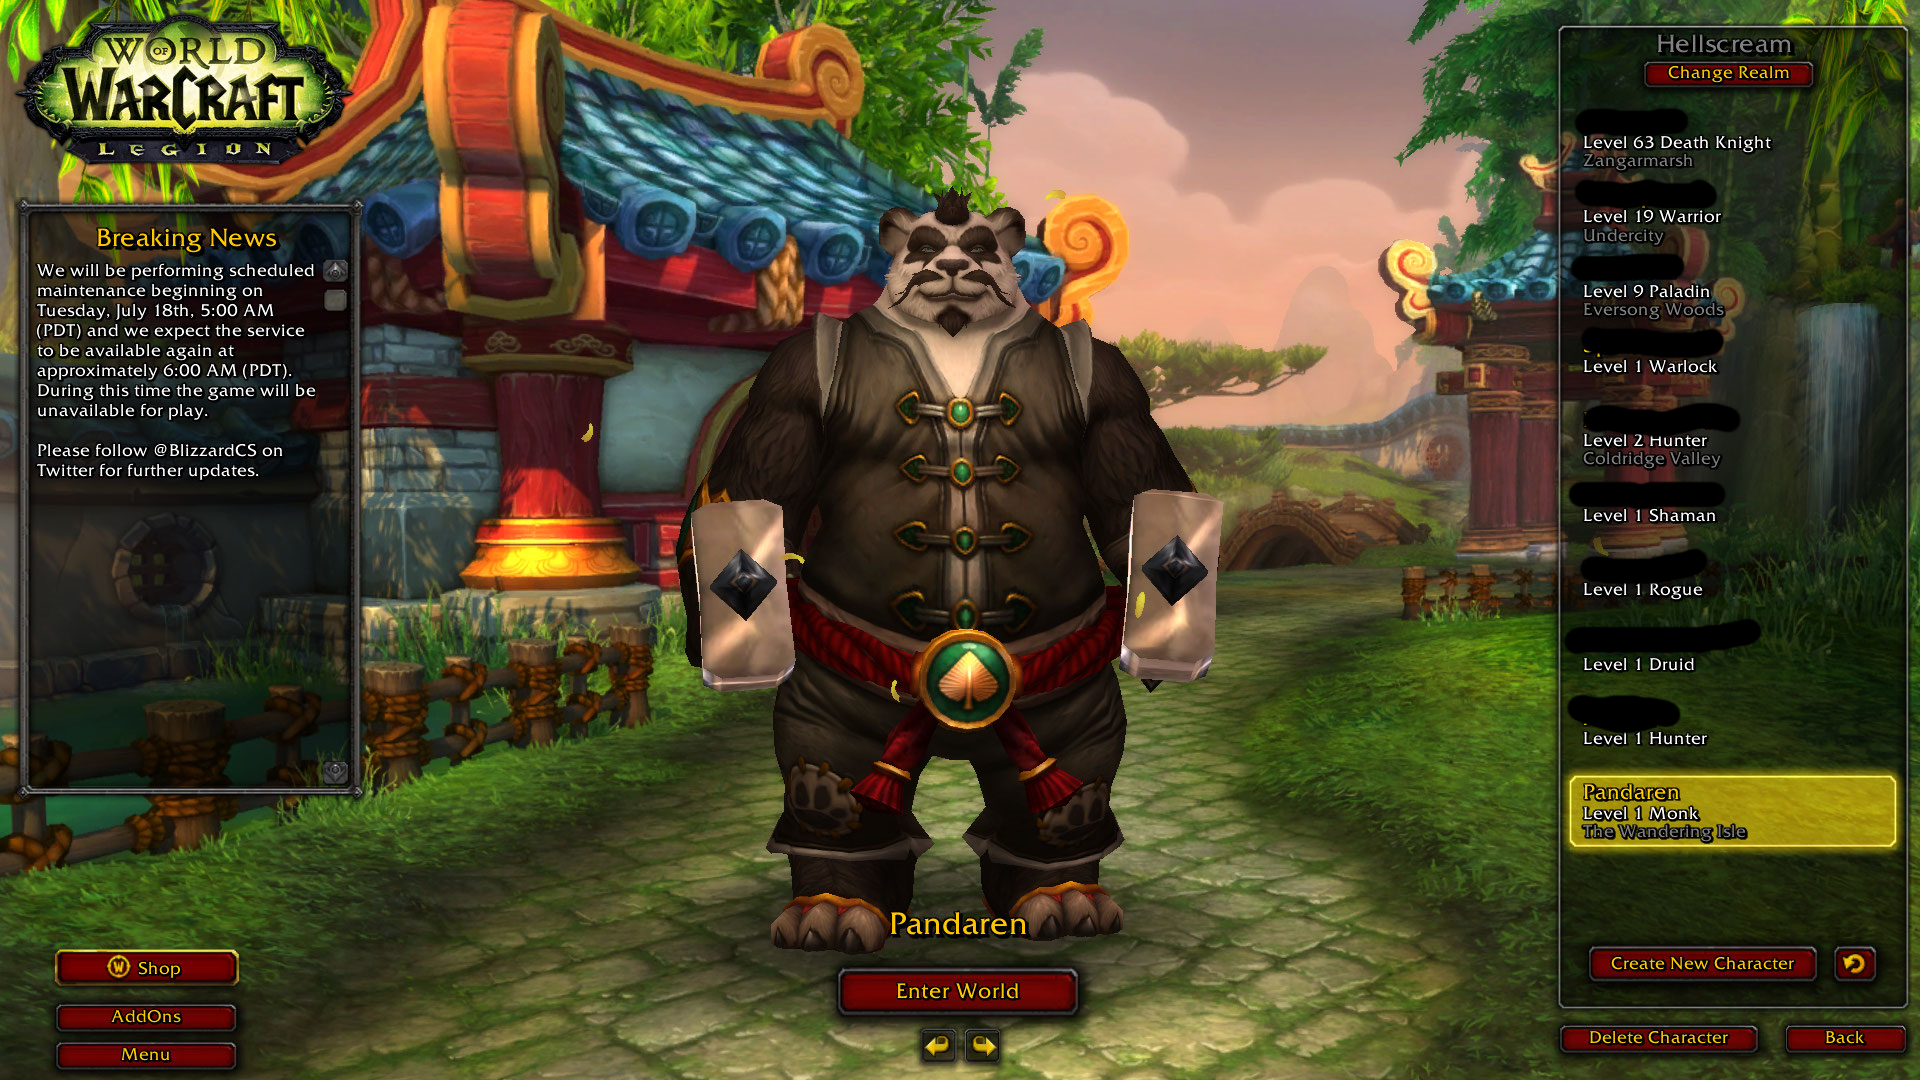 Pandaren rule 34